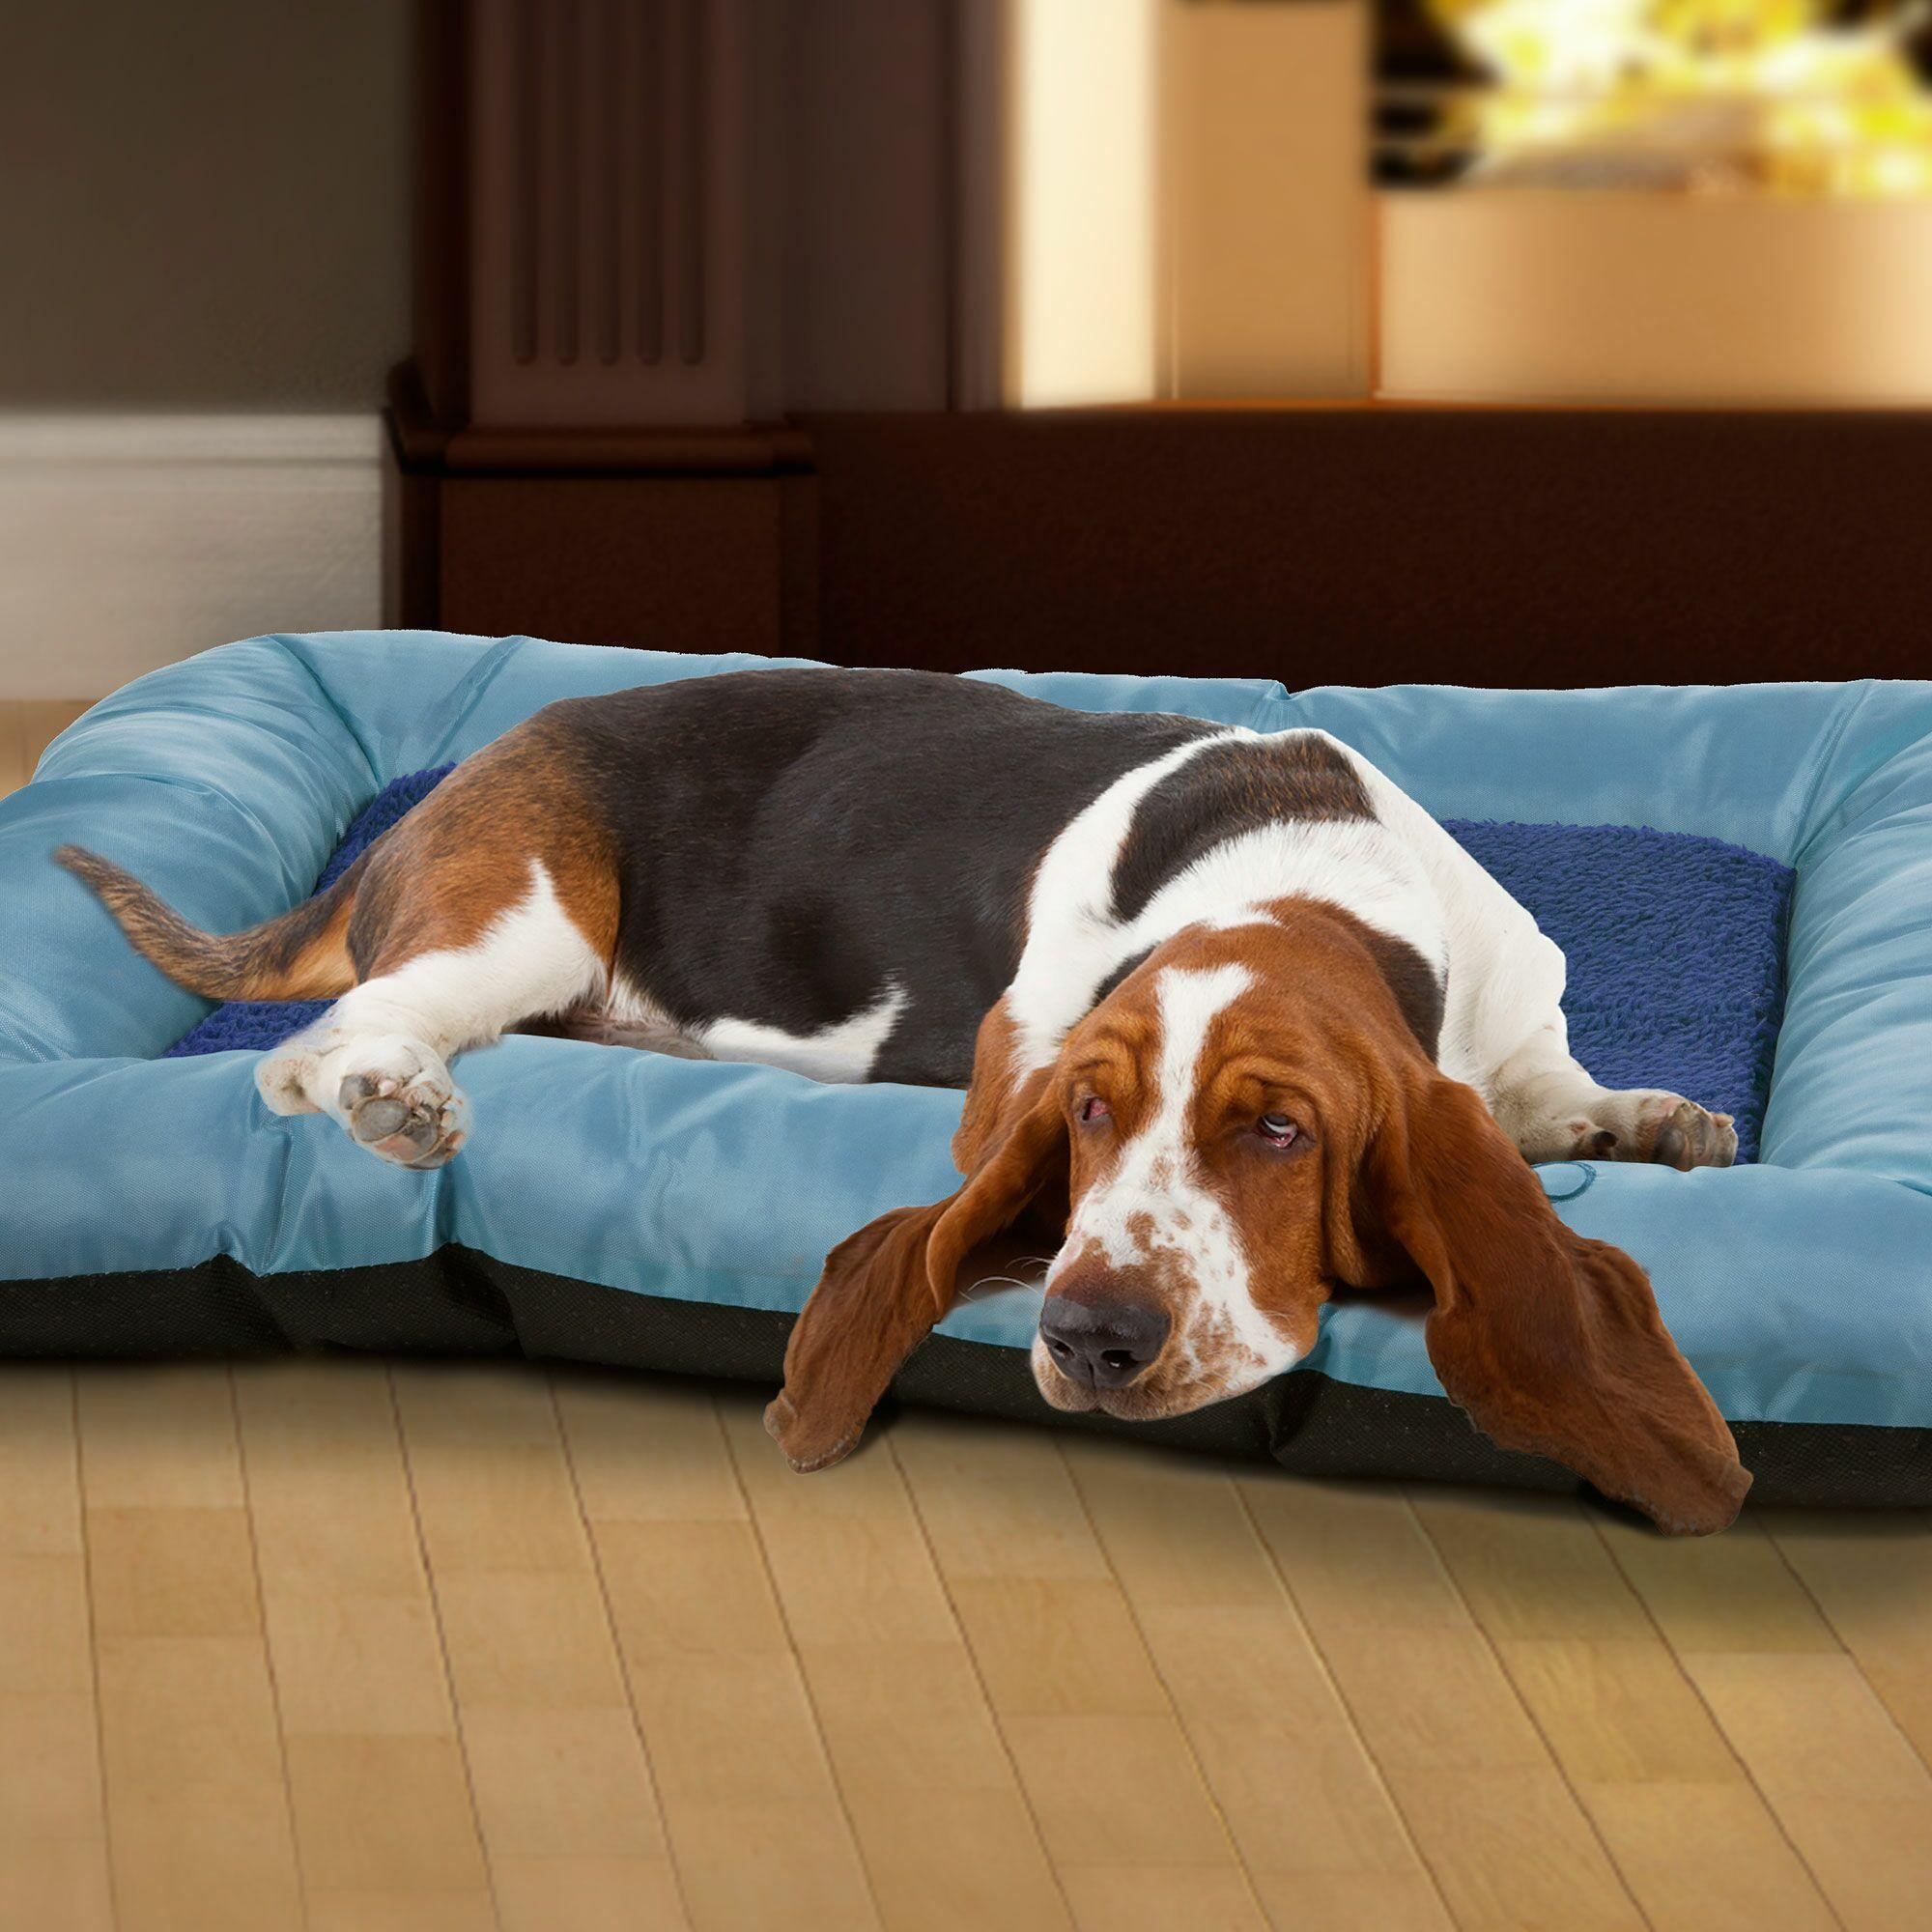 Burke Plush Cozy Pet Crate Bolster Color: Blue, Size: Extra Large (46